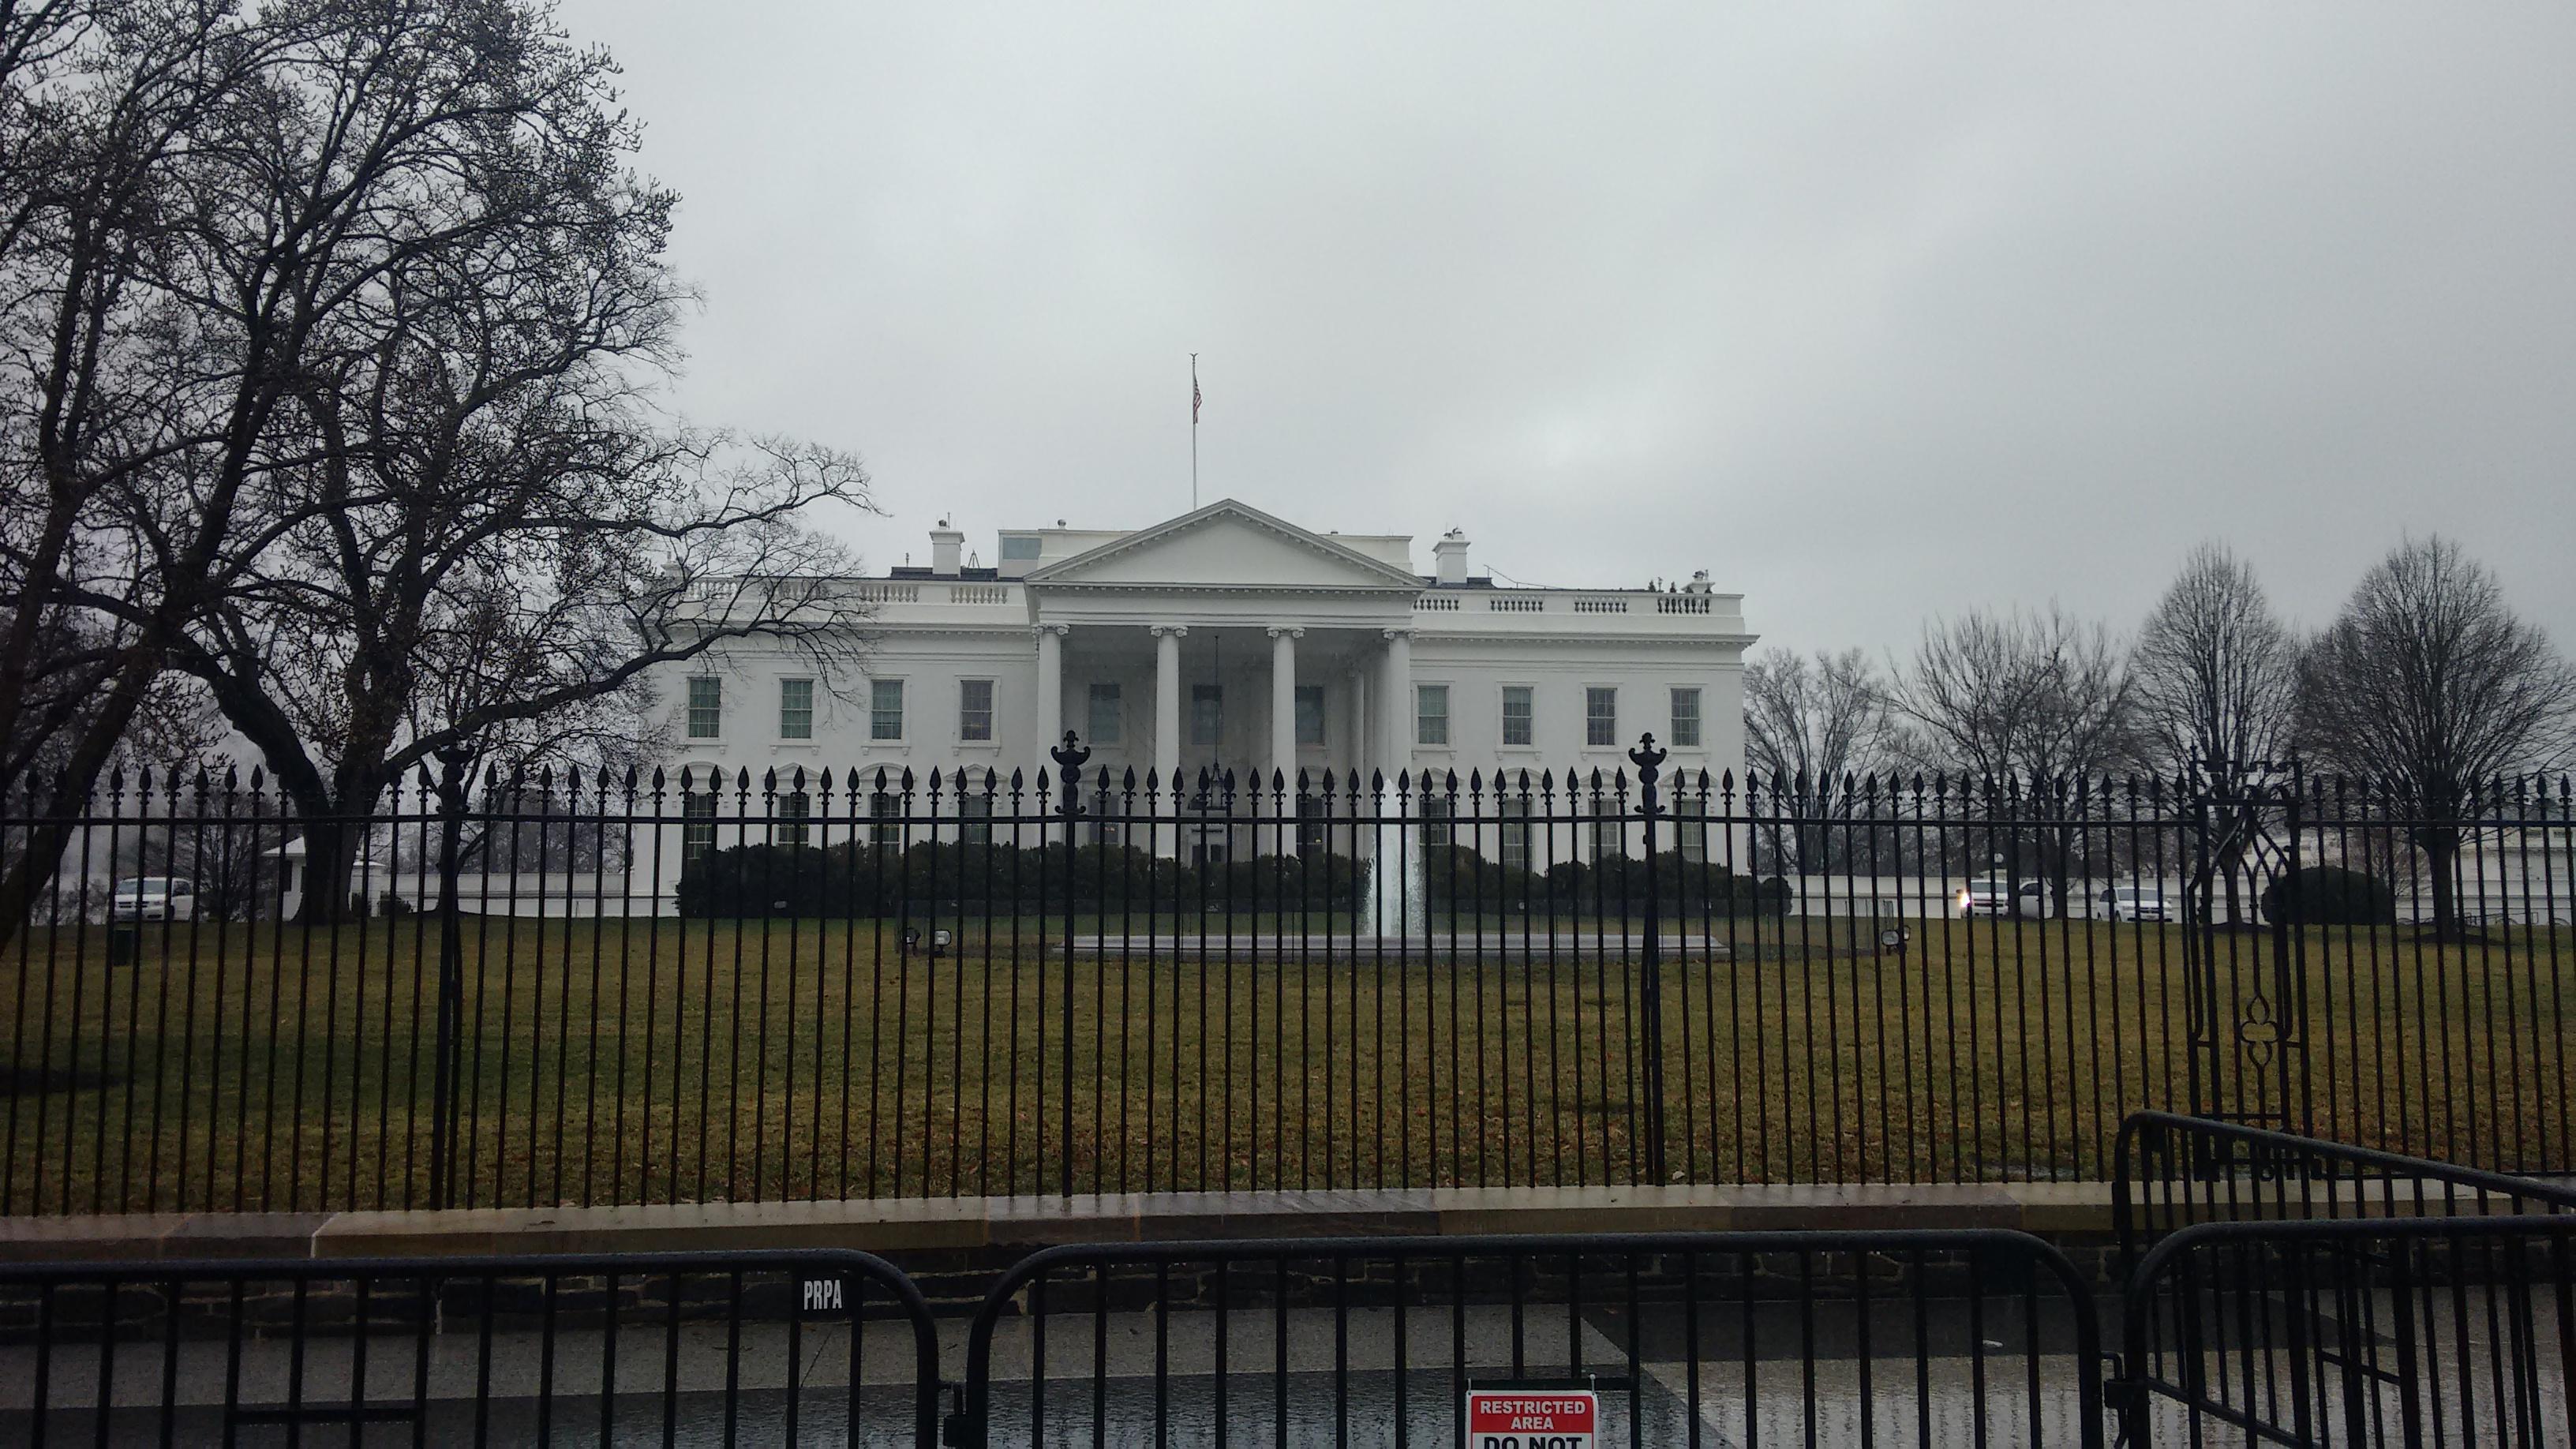 Chez Obama. Source: S. Kheraj